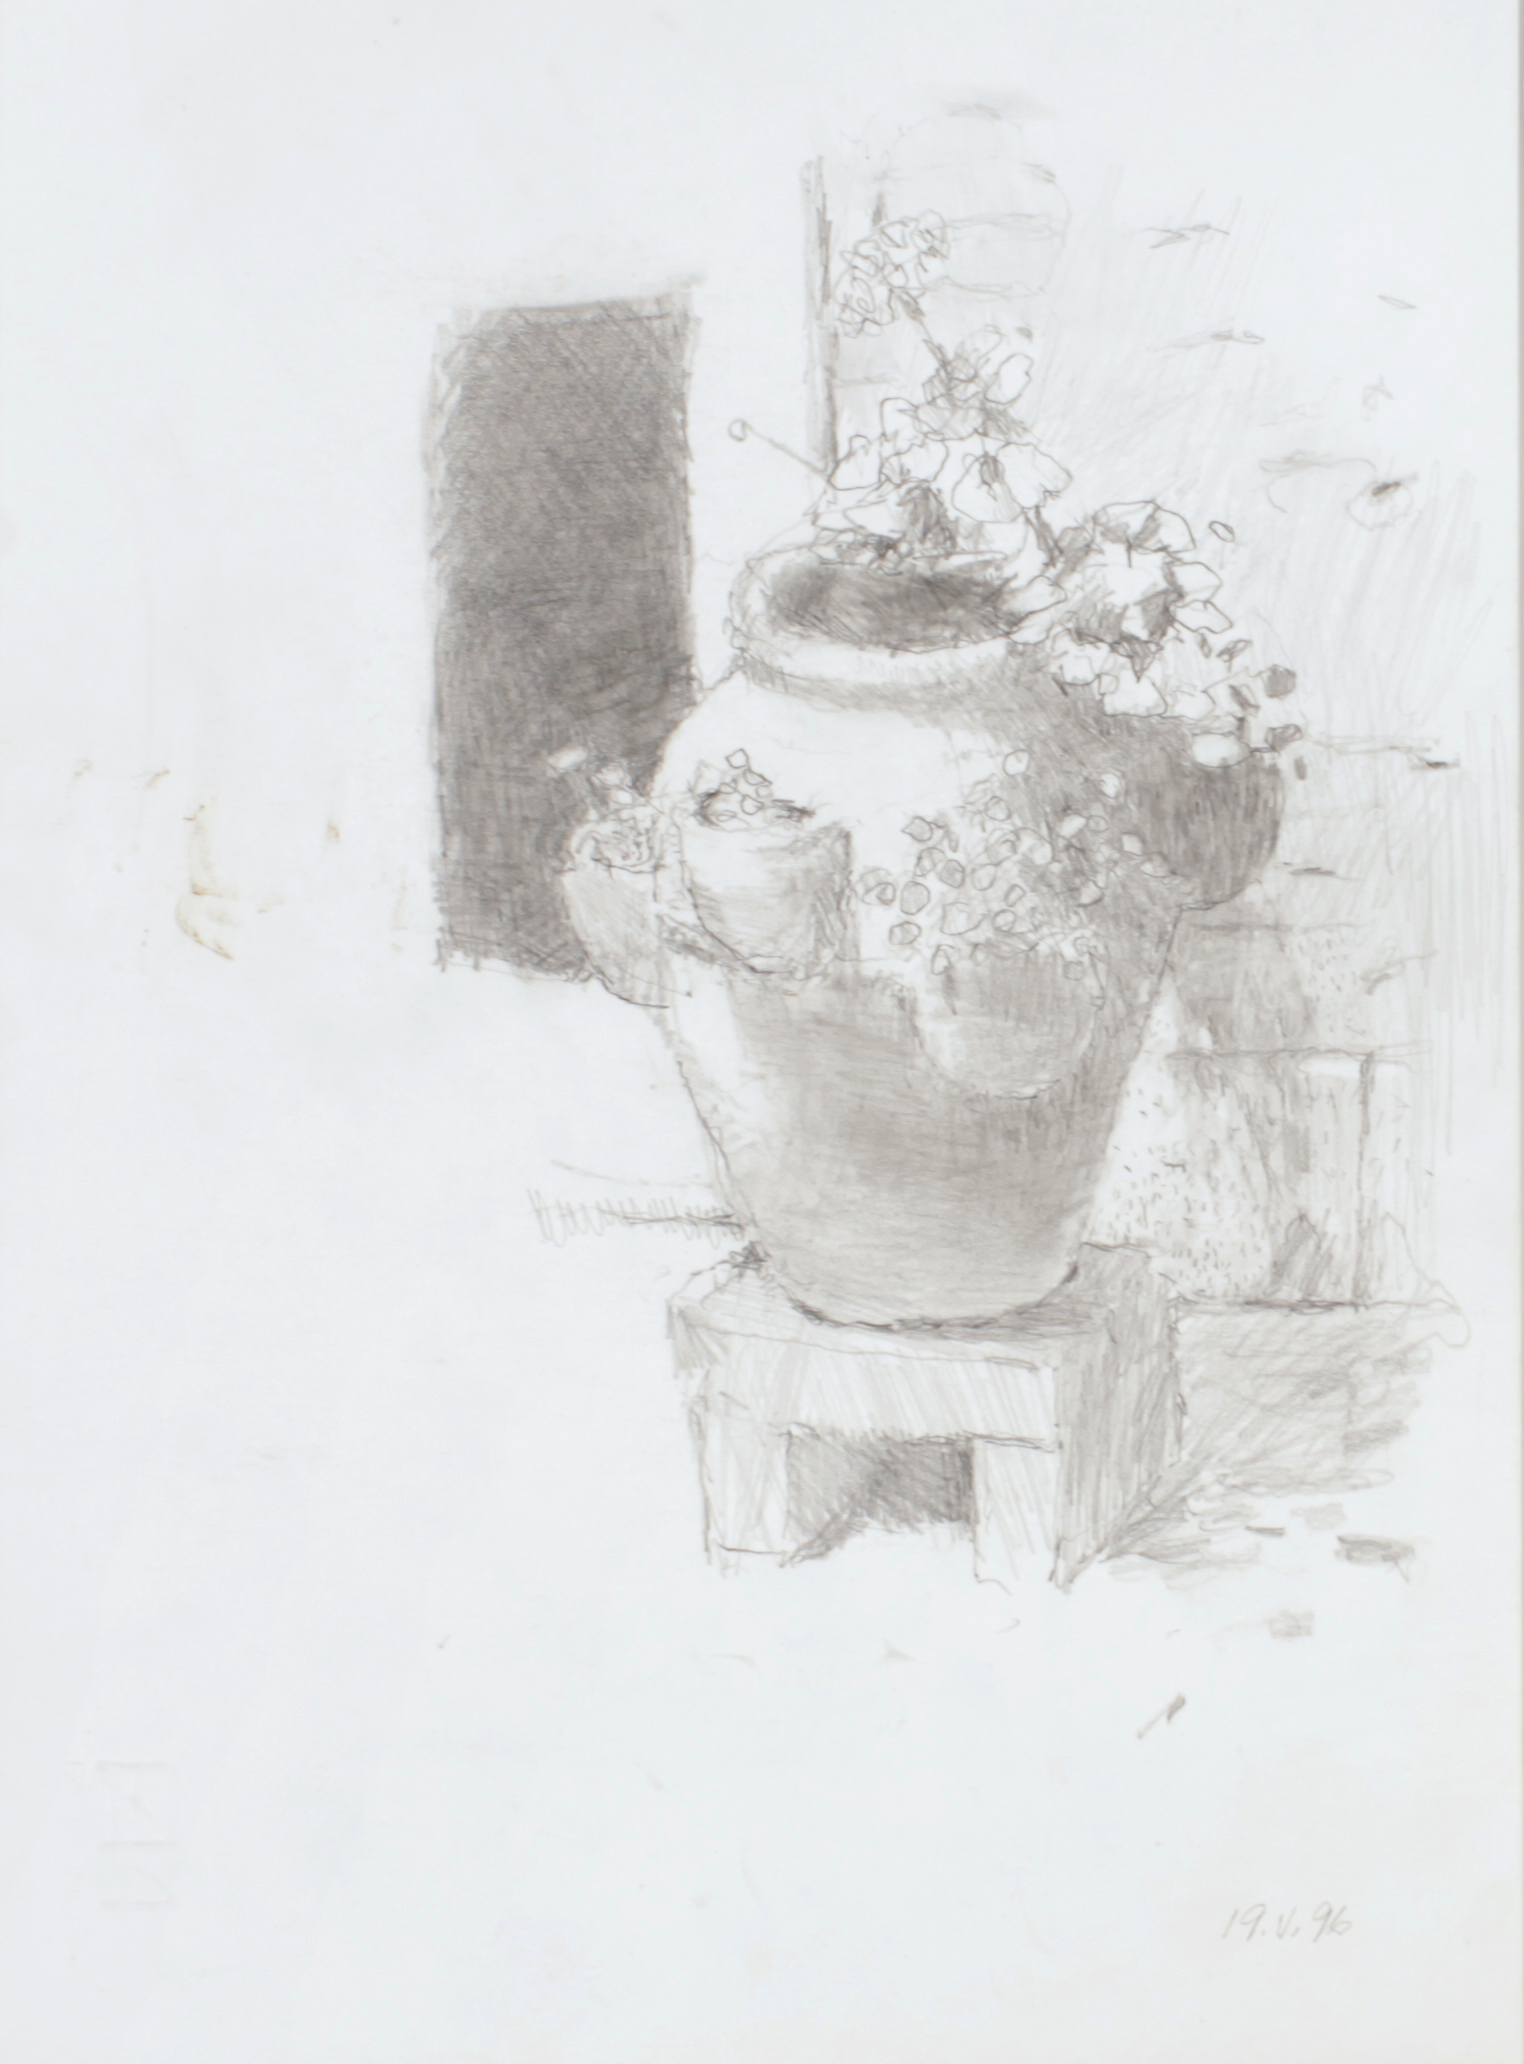 Flower Pot in Venice Courtyard